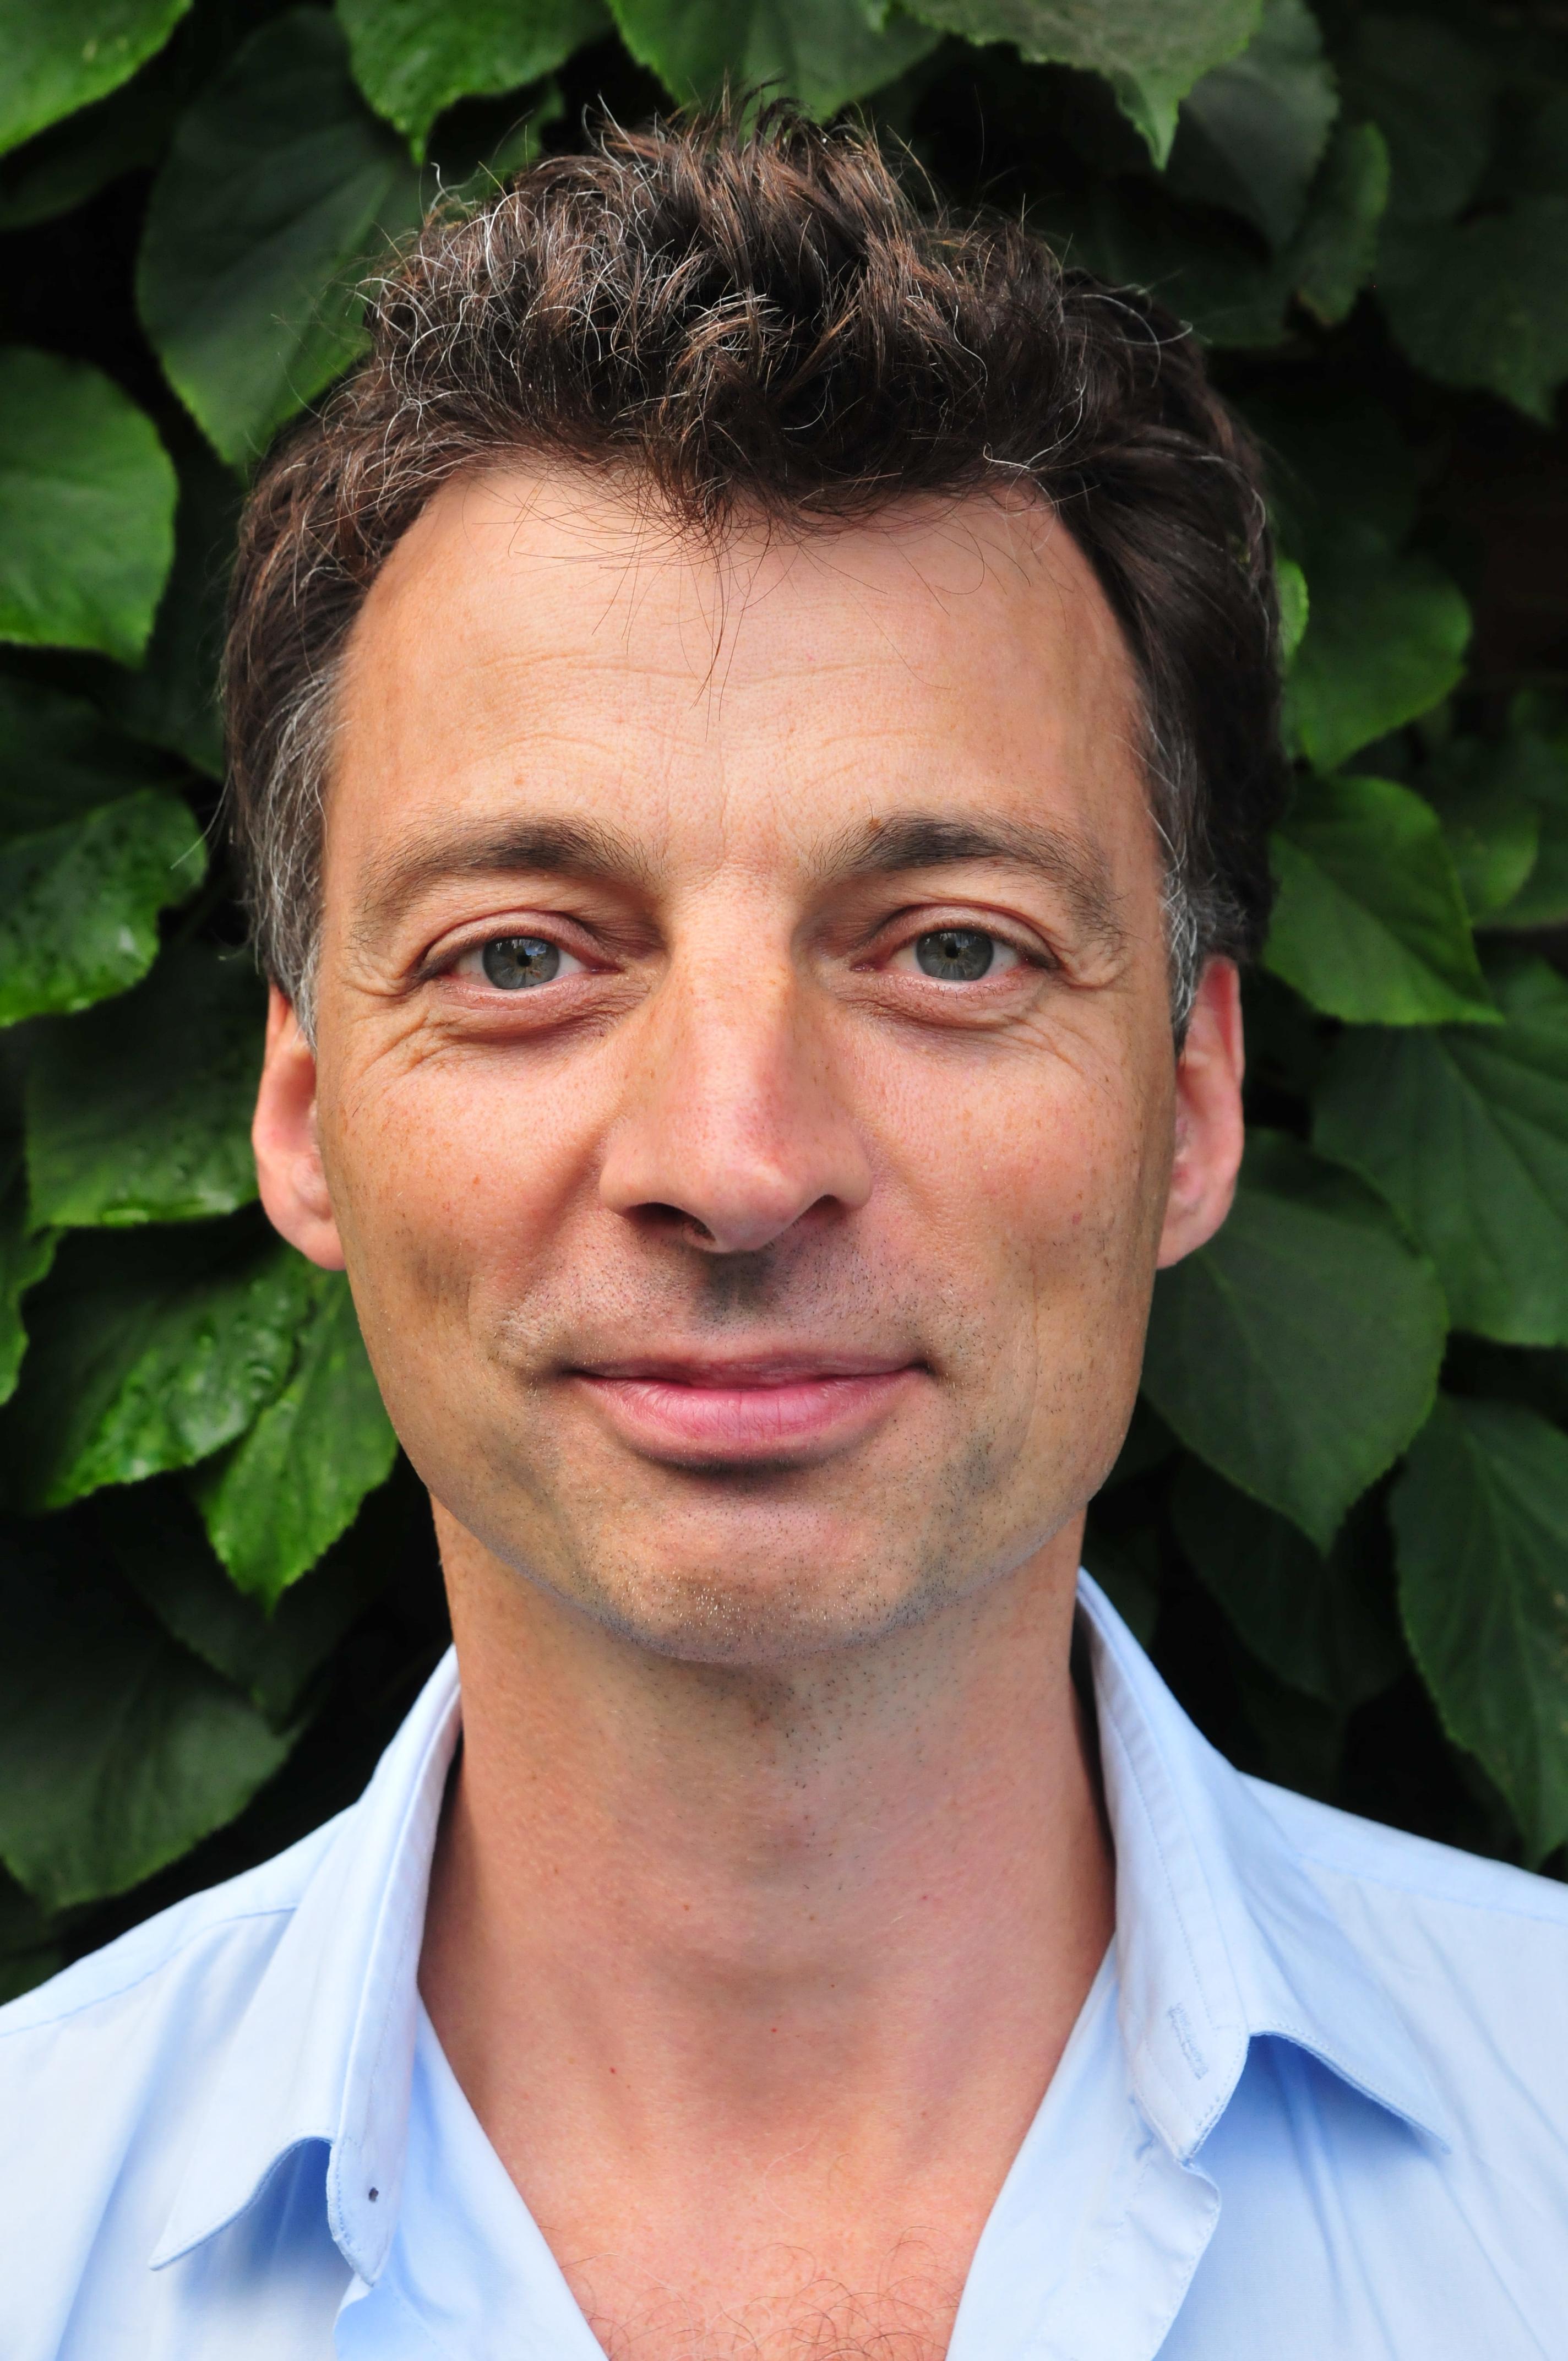 Willem Pinksterboer